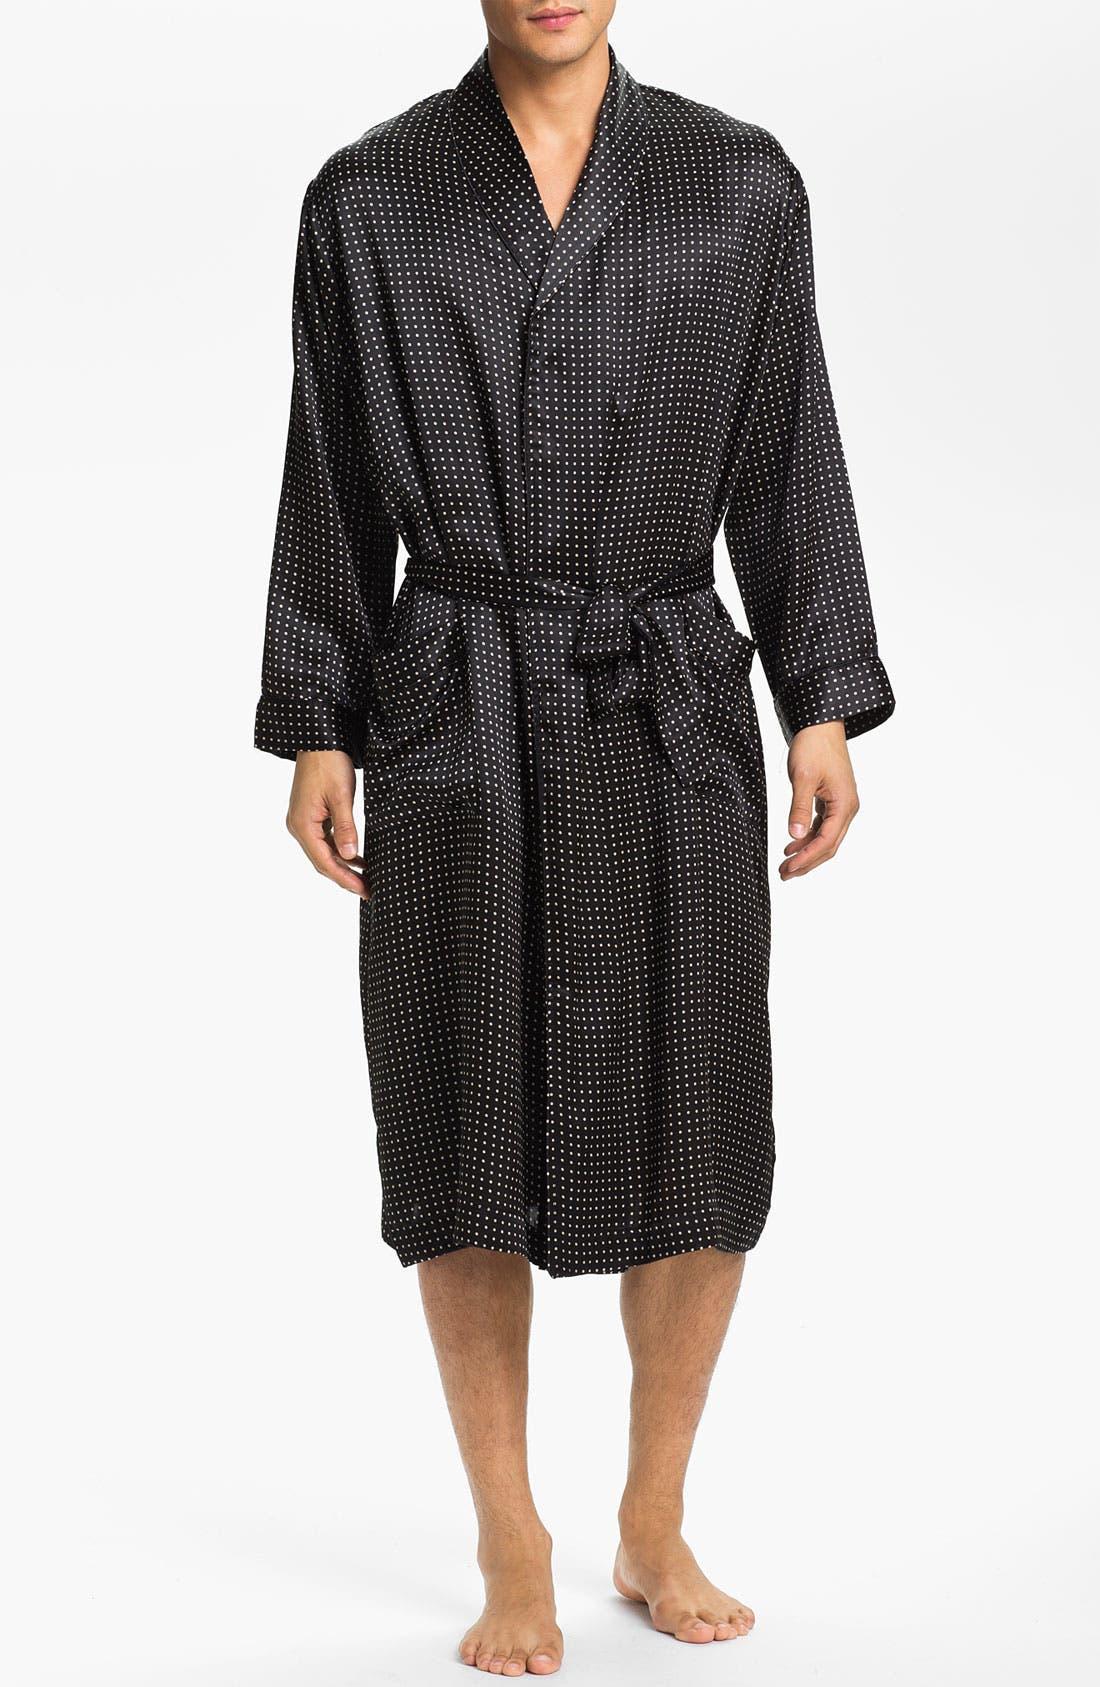 MAJESTIC INTERNATIONAL, Dot Silk Robe, Main thumbnail 1, color, BLACK